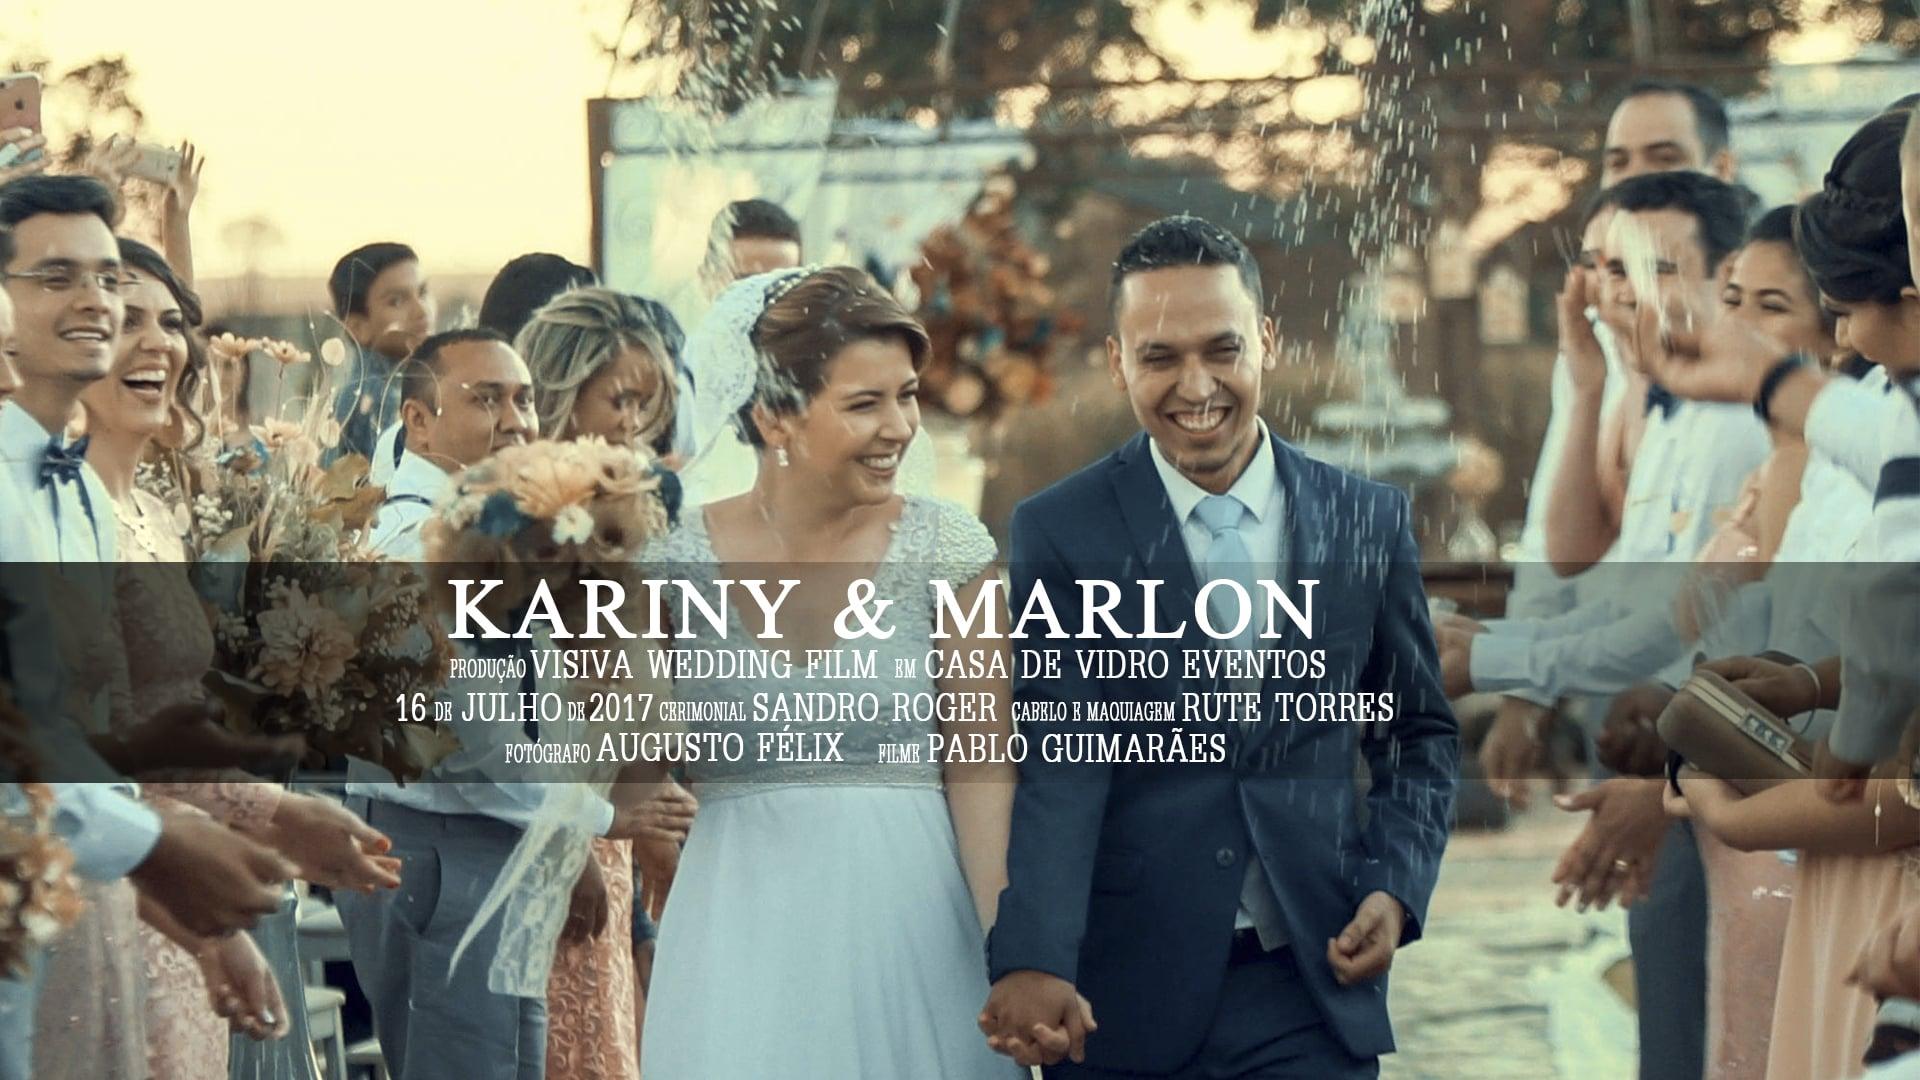 Visiva Wedding Film